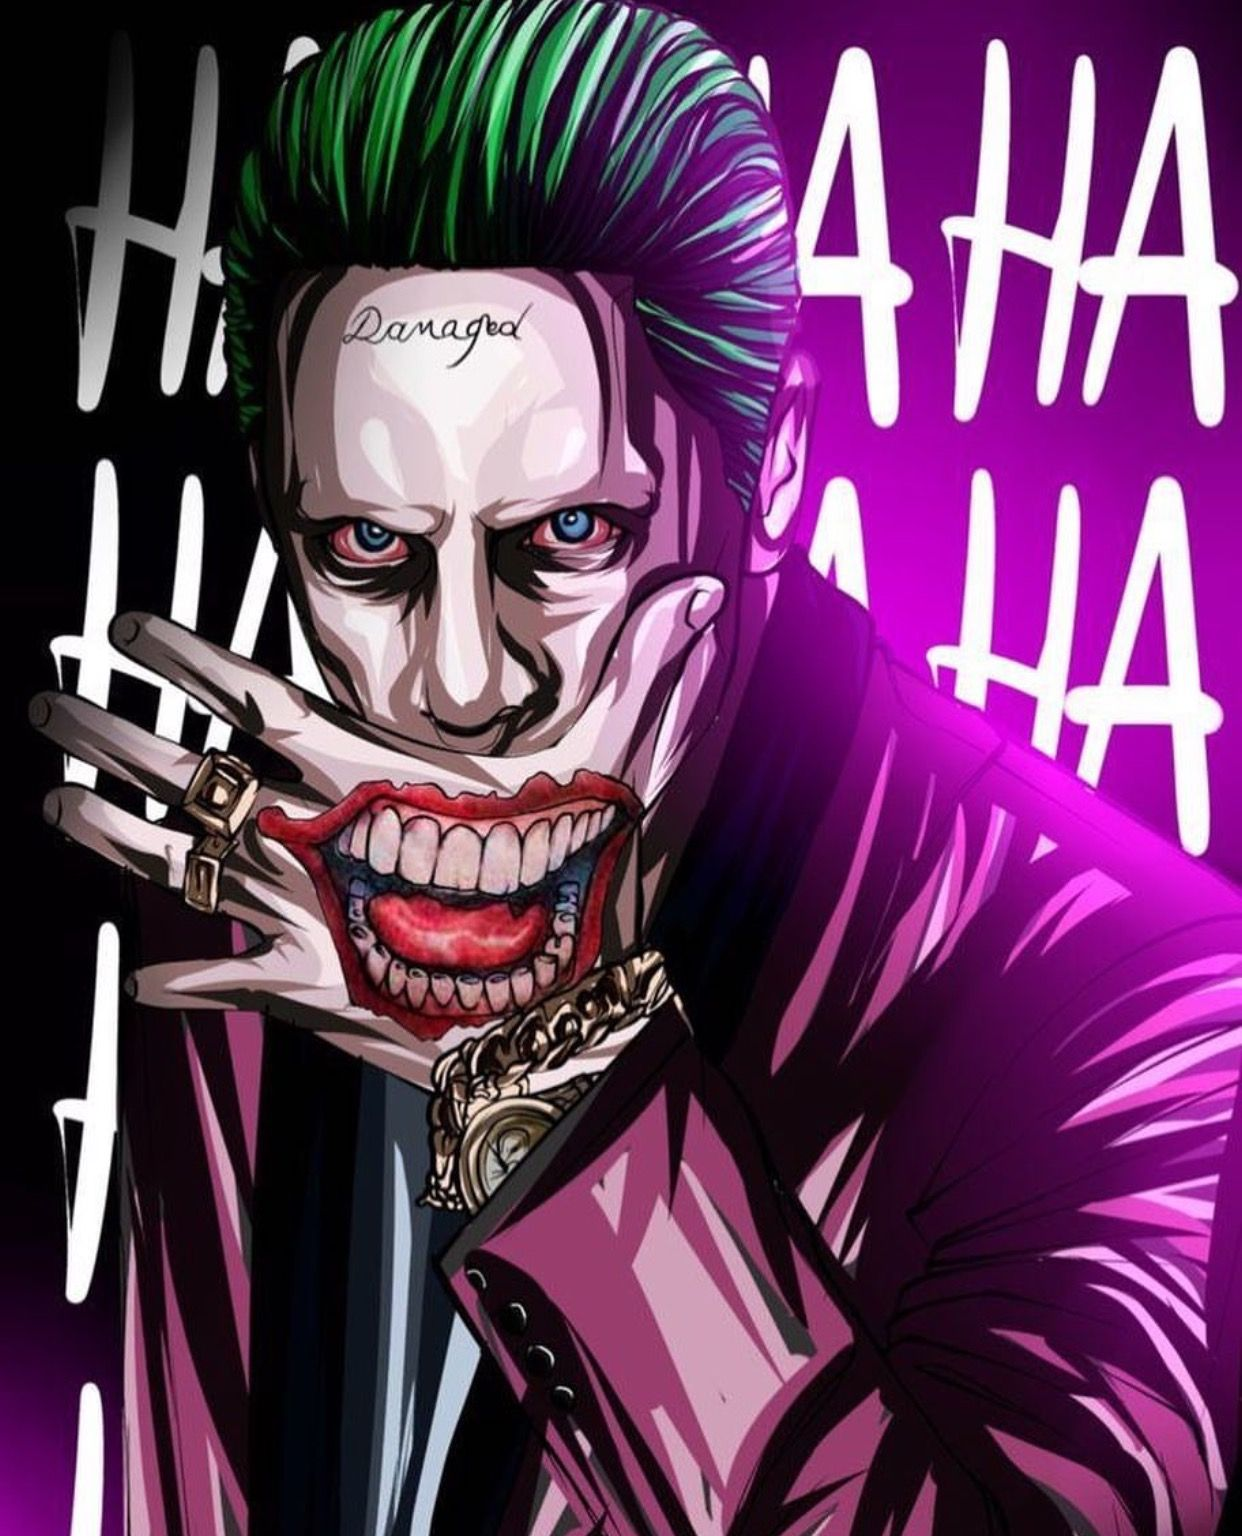 Pin Oleh Ladurshaan Varenthiran Di Batman In A Joker Harley World Karya Seni 3d Seni Gelap Gambar Serigala